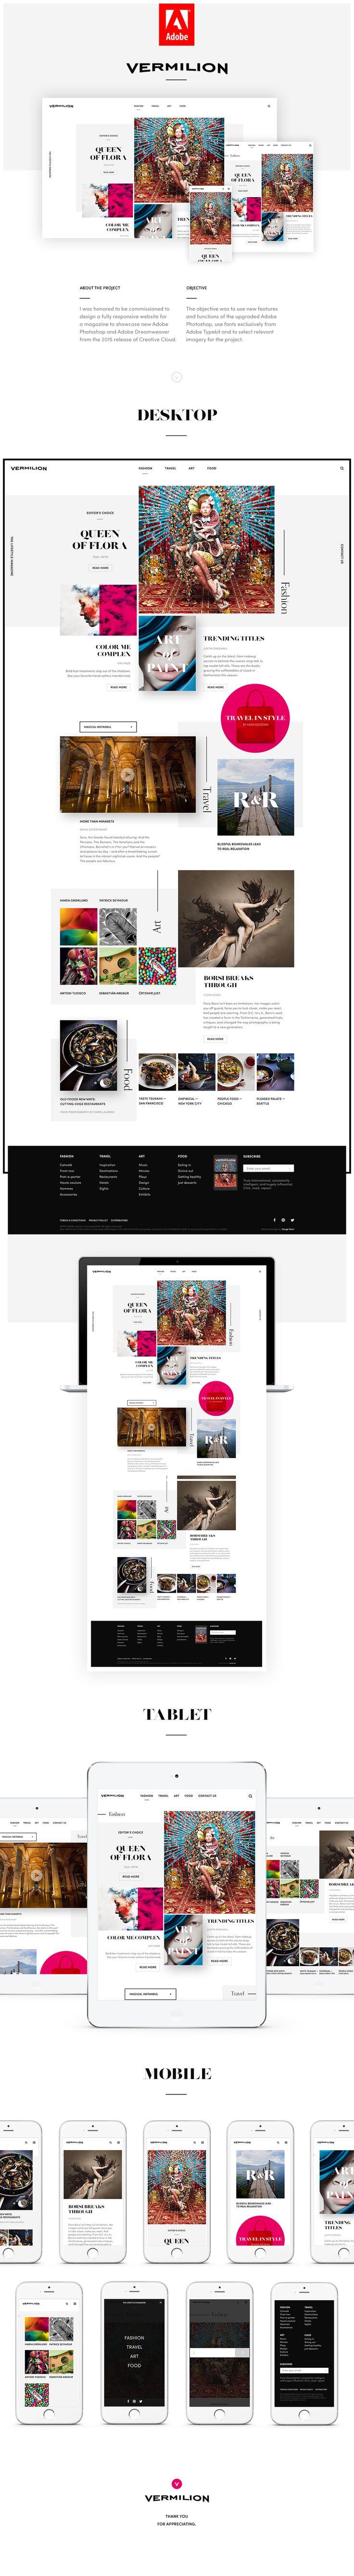 Vermilion — Responsive Demo Website for Adobe on Behance